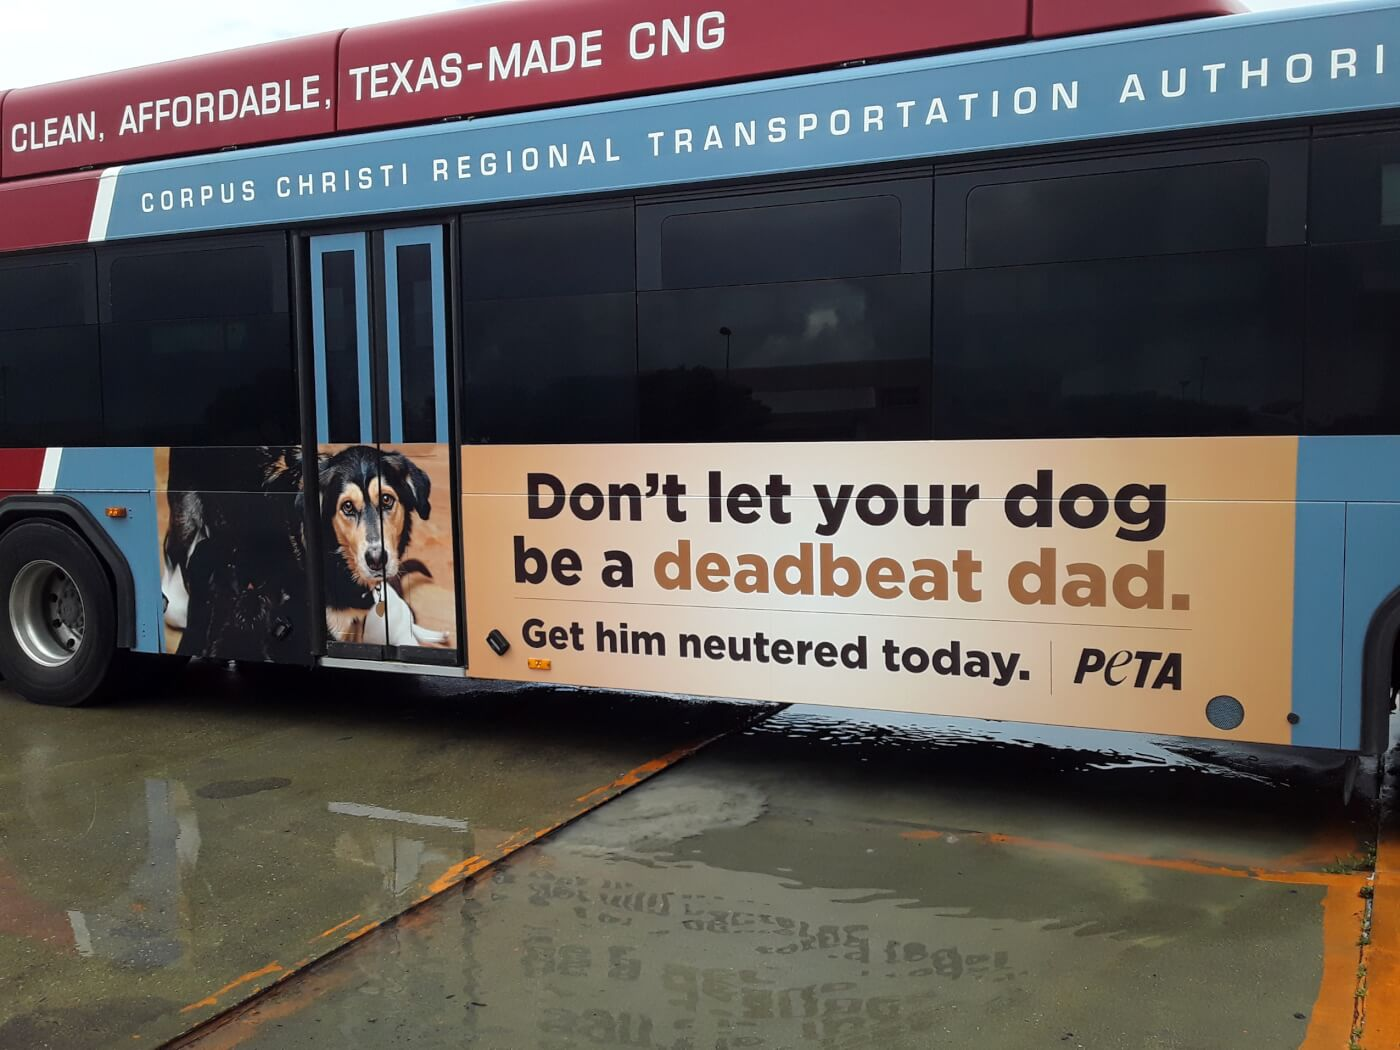 Deadbeat Dad PETA dog ads hit Corpus Christi